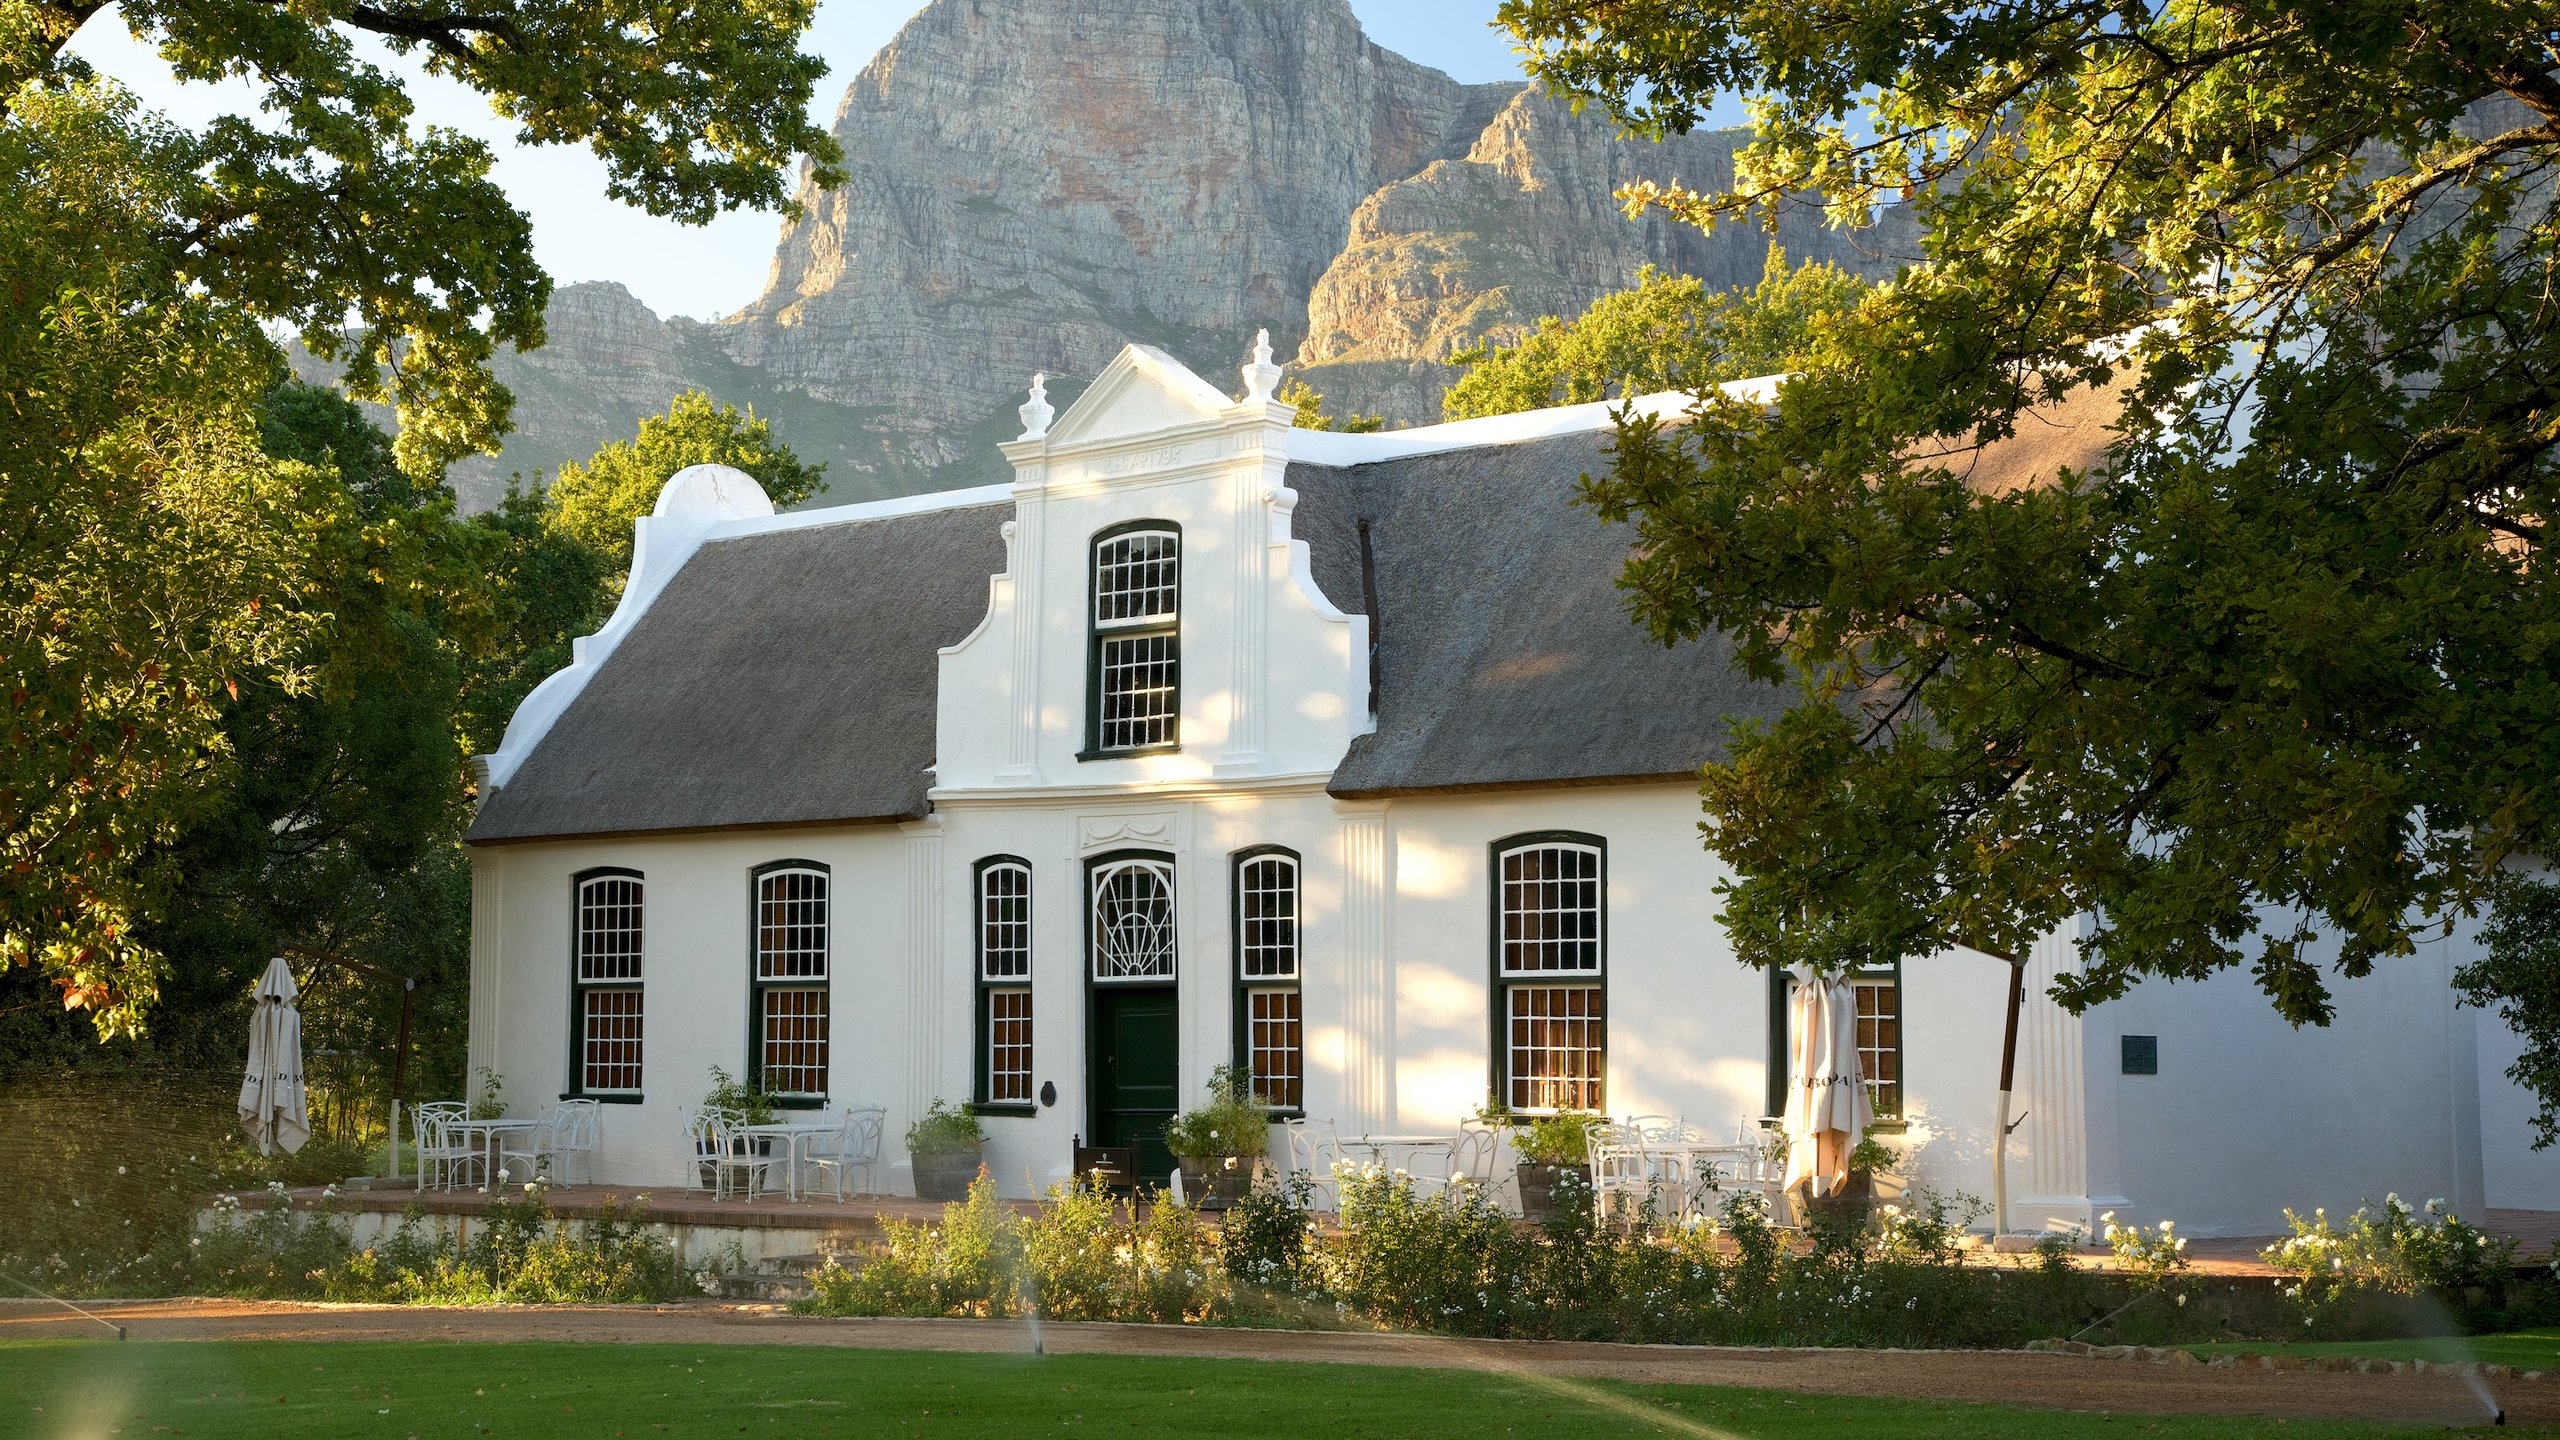 Cape Winelands, Western Cape, South Africa